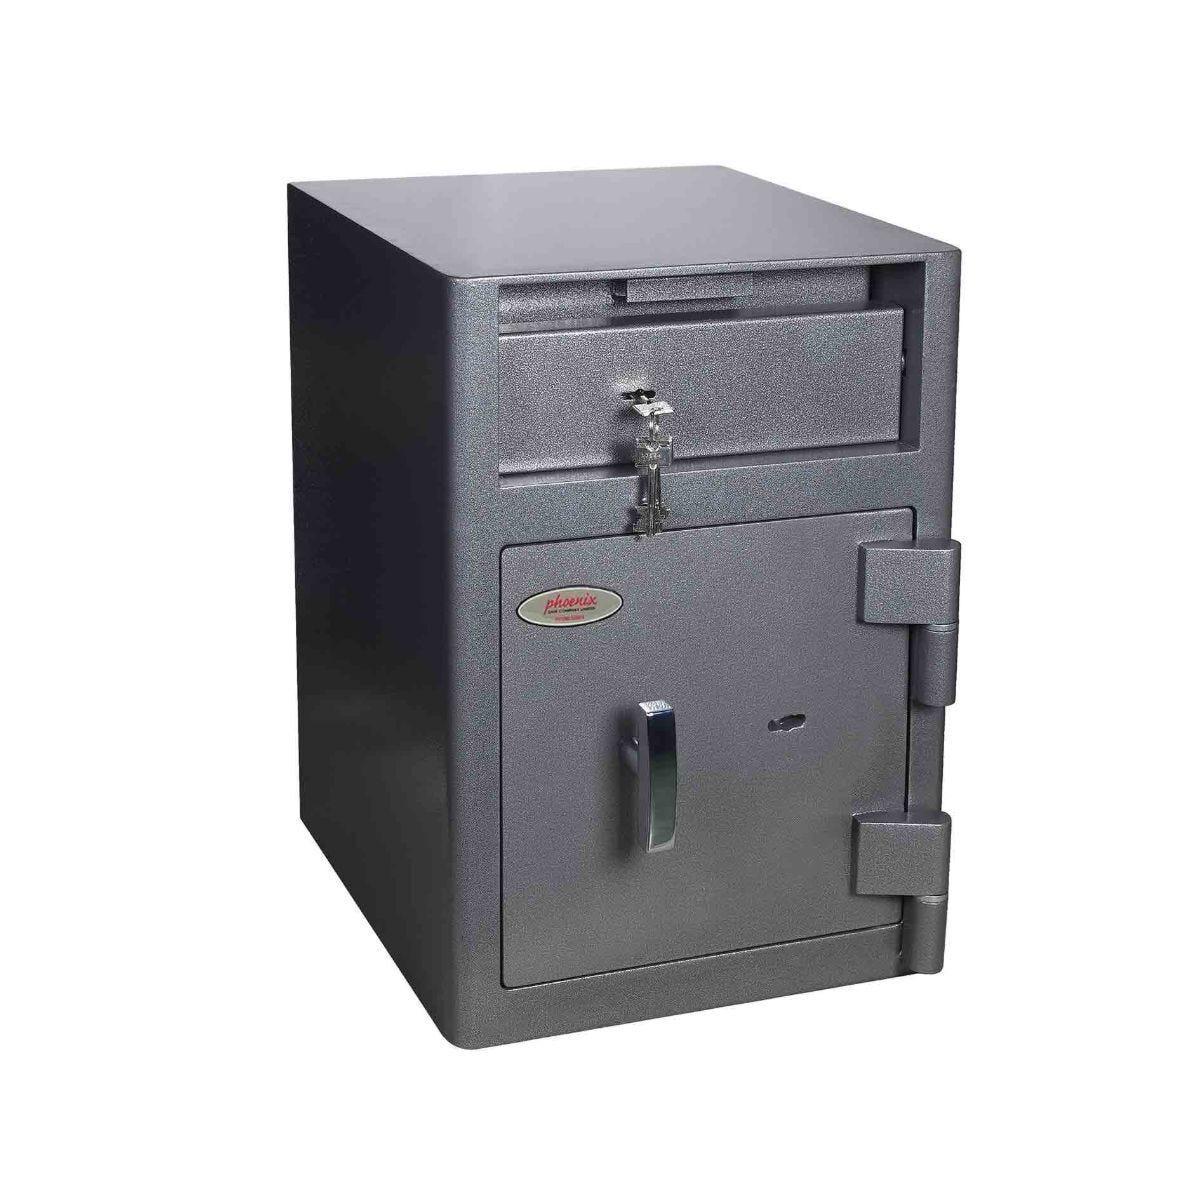 Phoenix Cash Deposit Security Safe with Key Lock Size 1